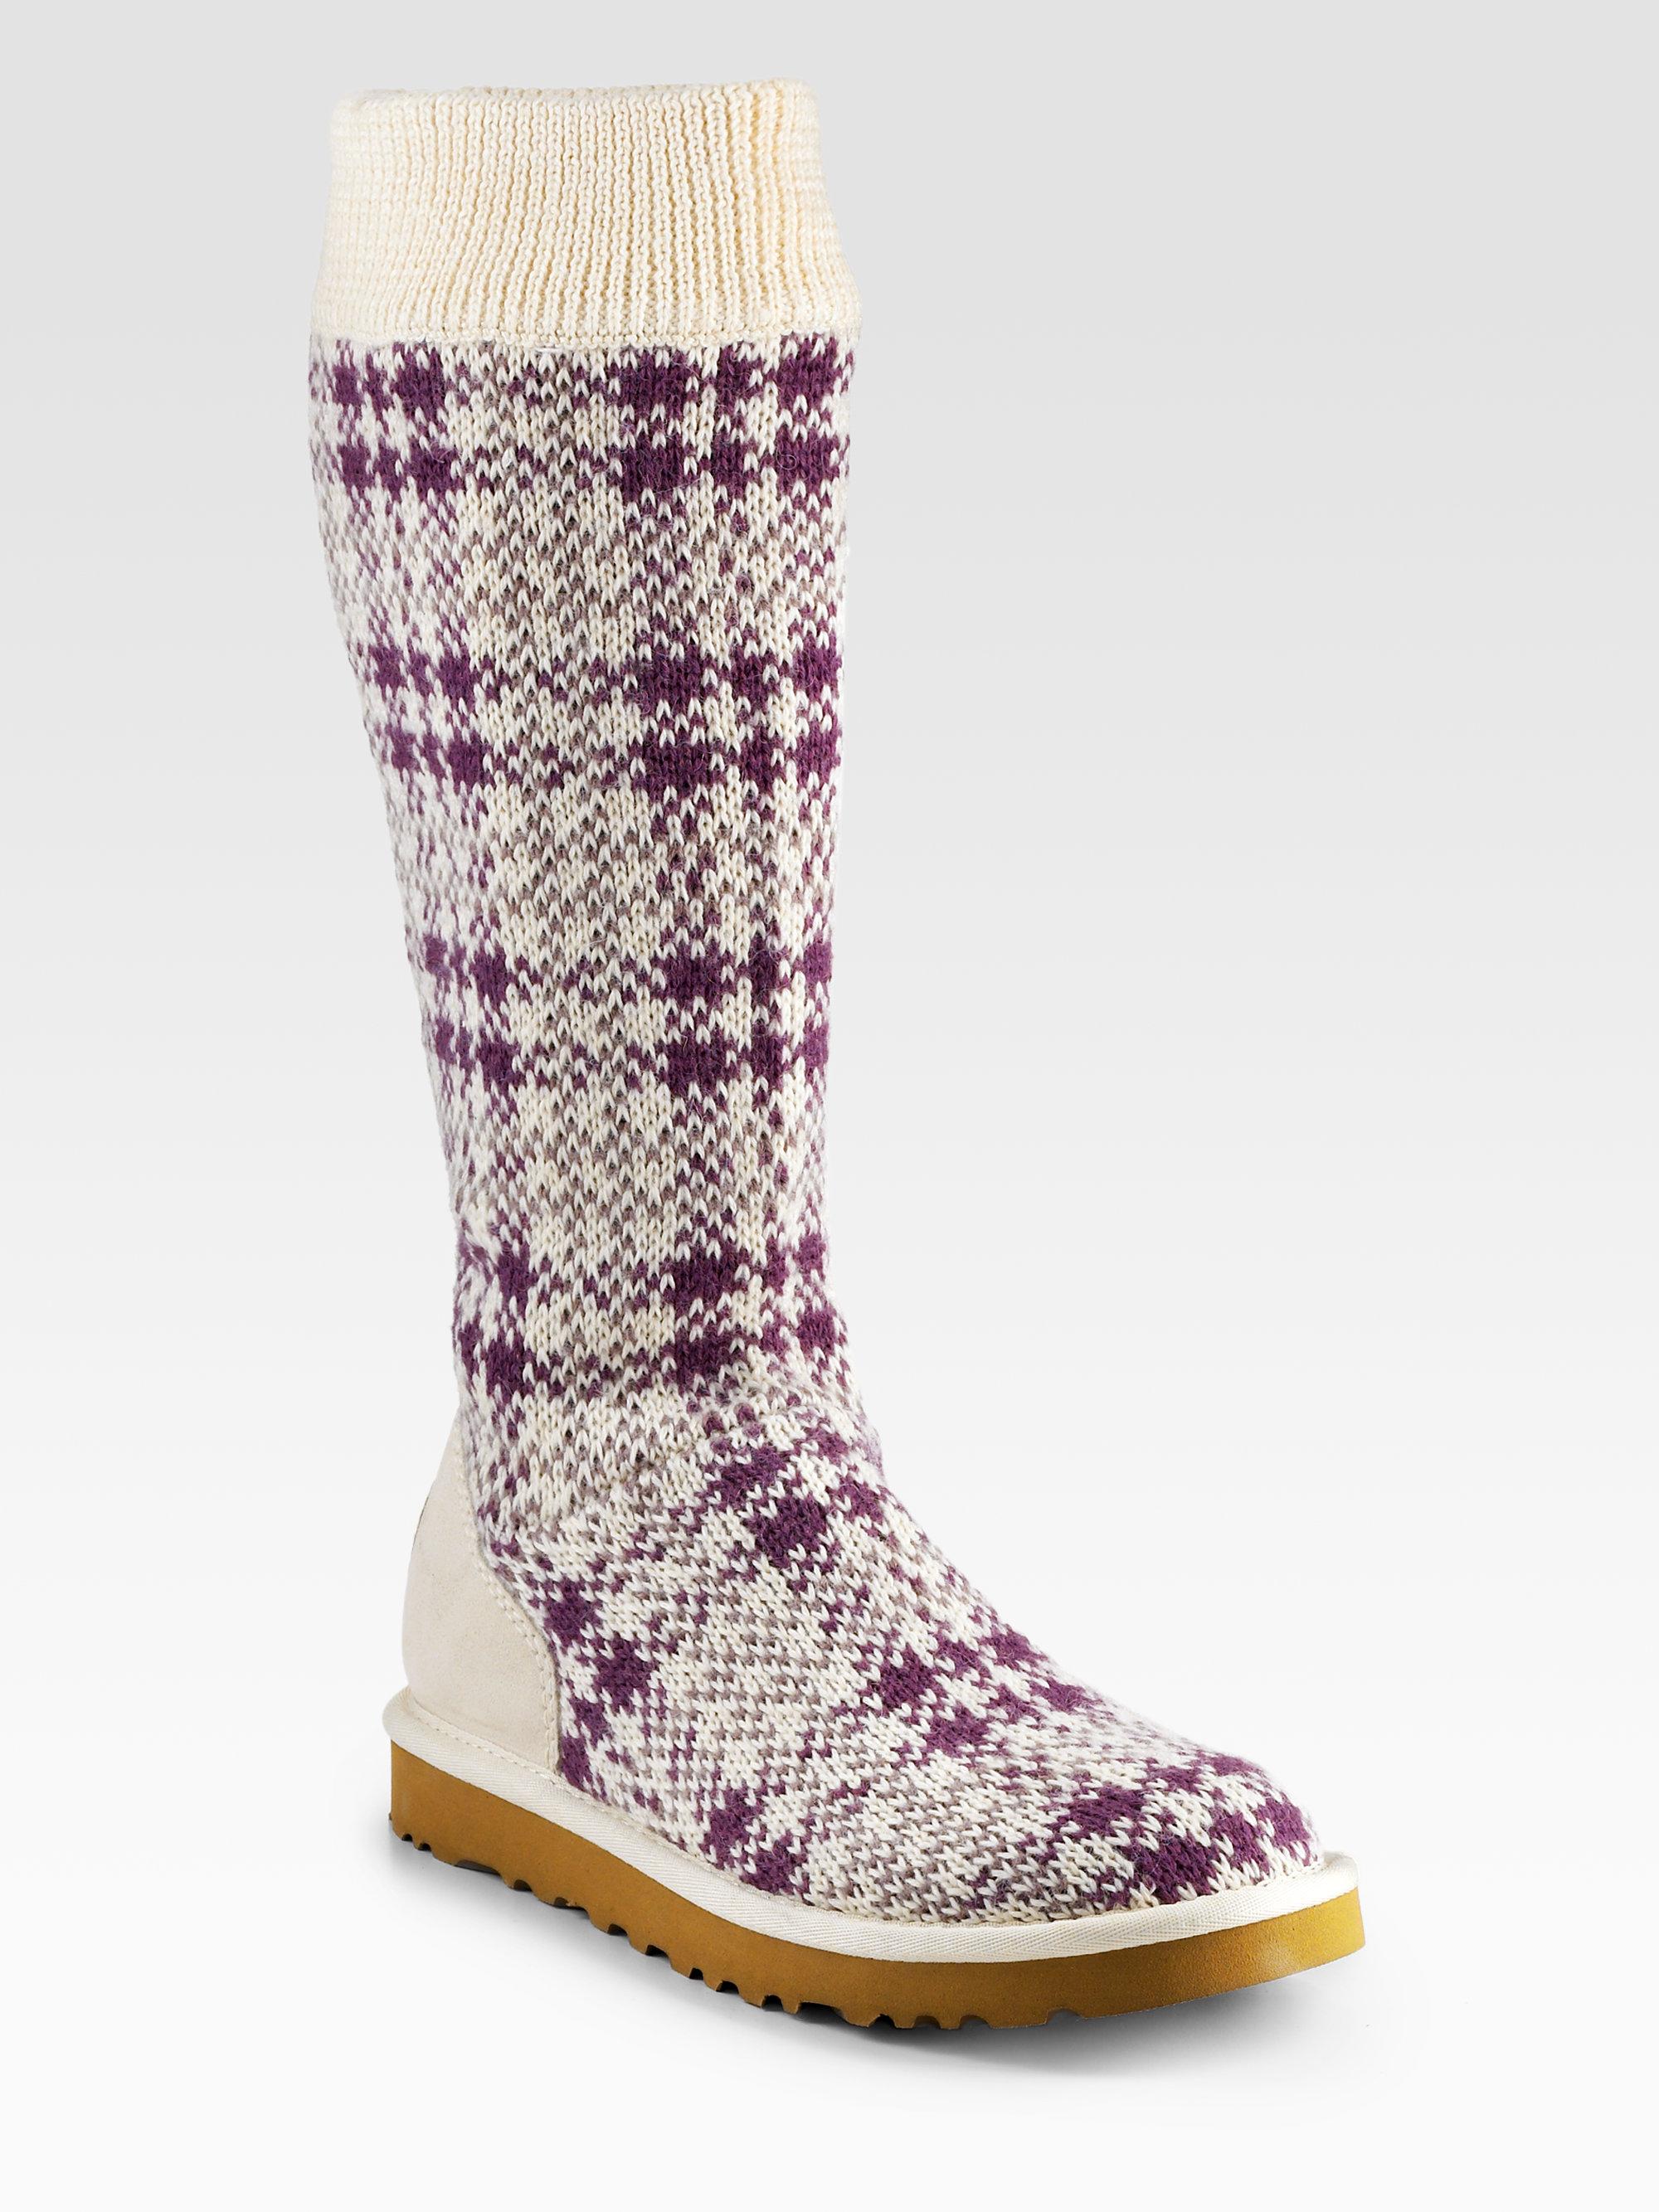 Ugg Tall Plaid Wool Knit Boots In Purple Lyst